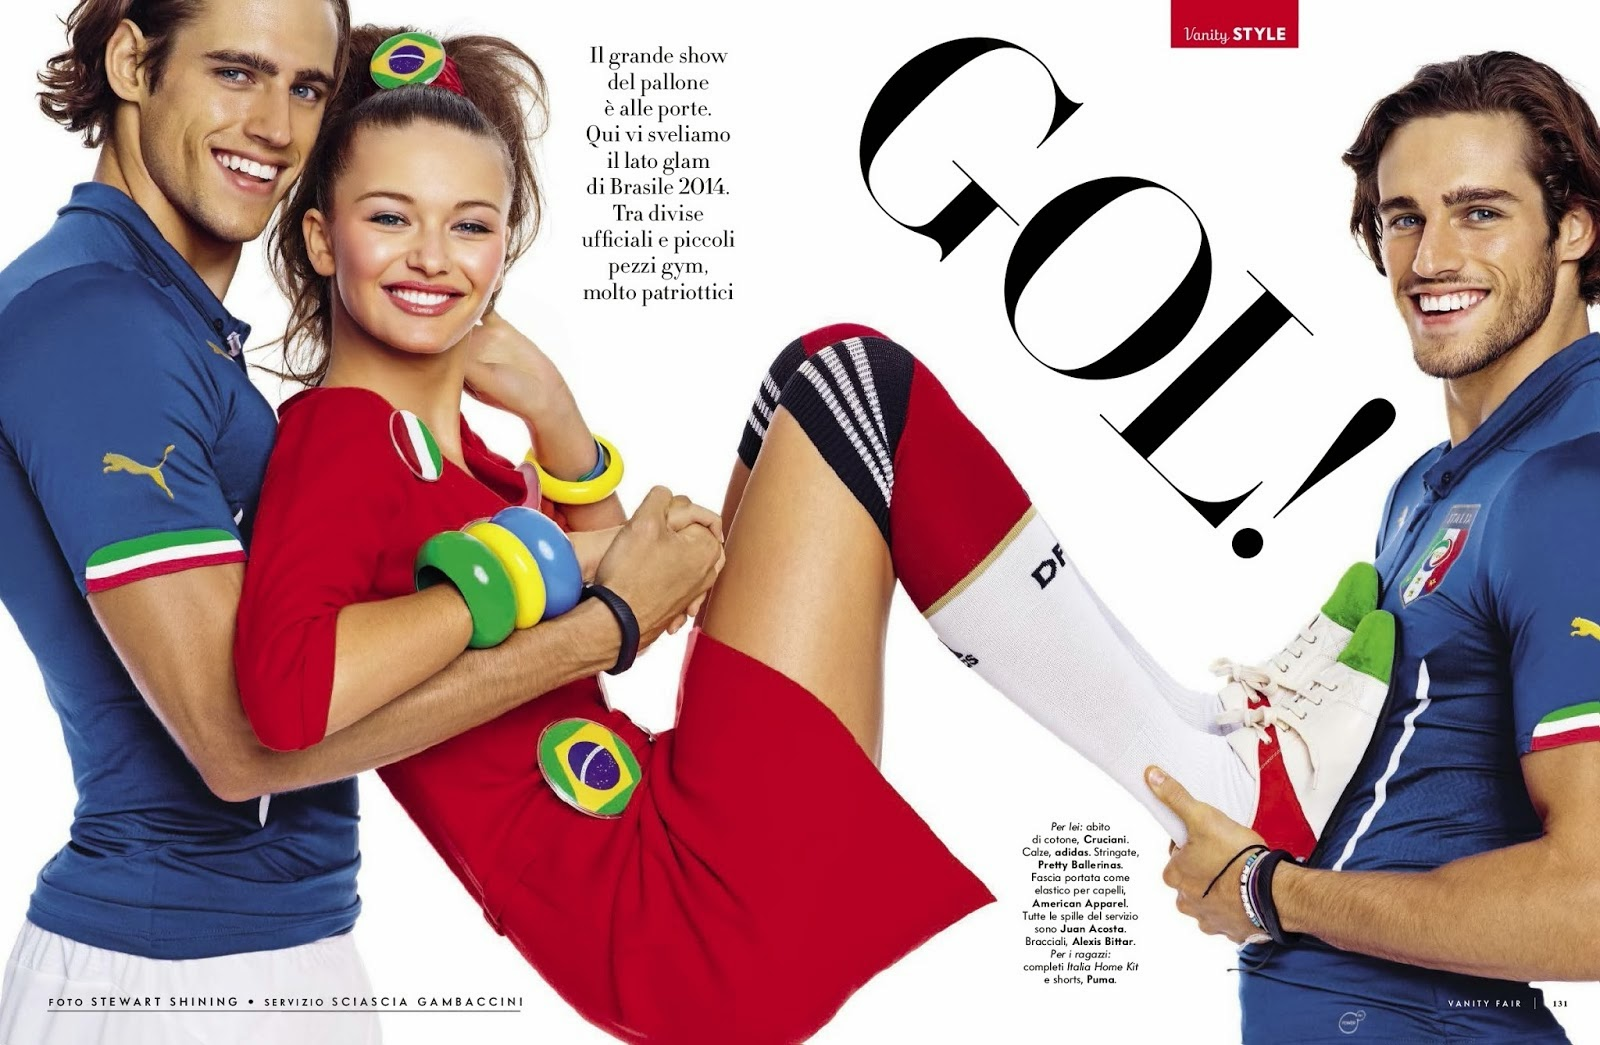 Kristina Romanova And Jordan And Zac Stenmark By Stewart Shining For Vanity Fair Magazine, Italia, June 2014